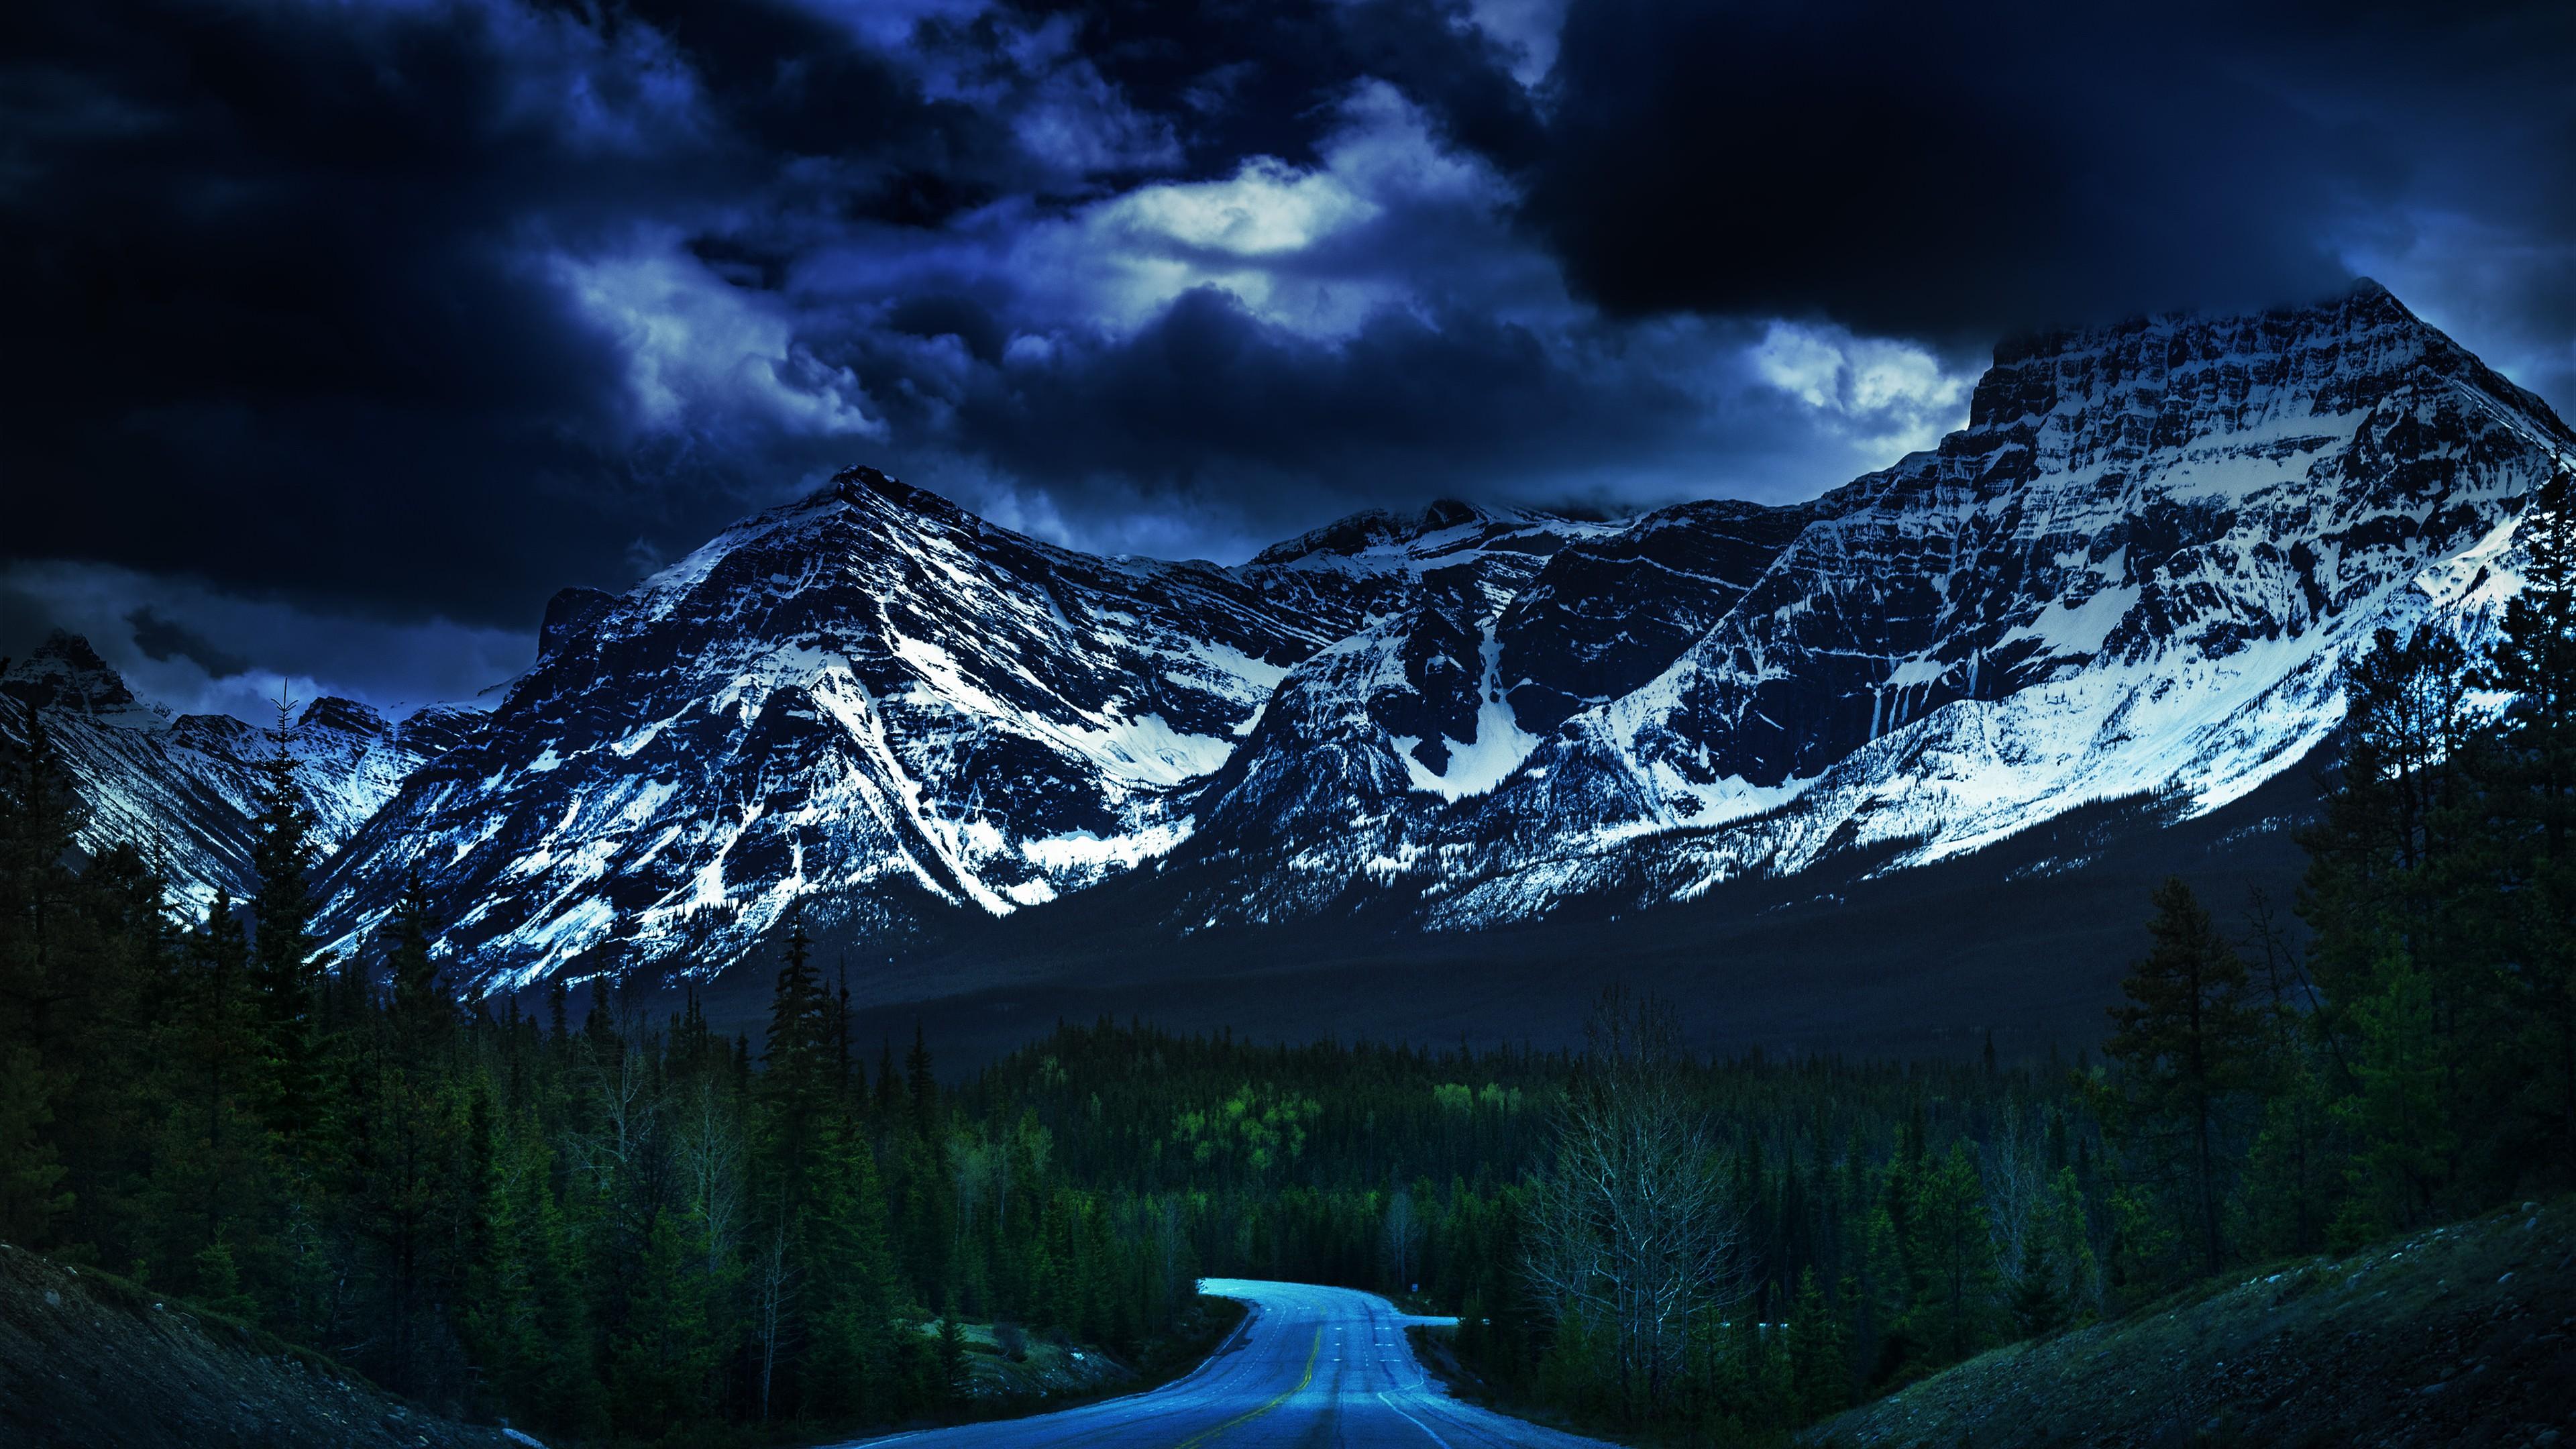 Falling Darkness HD wallpaper for 4K 3840 x 2160   HDwallpapersnet 3840x2160